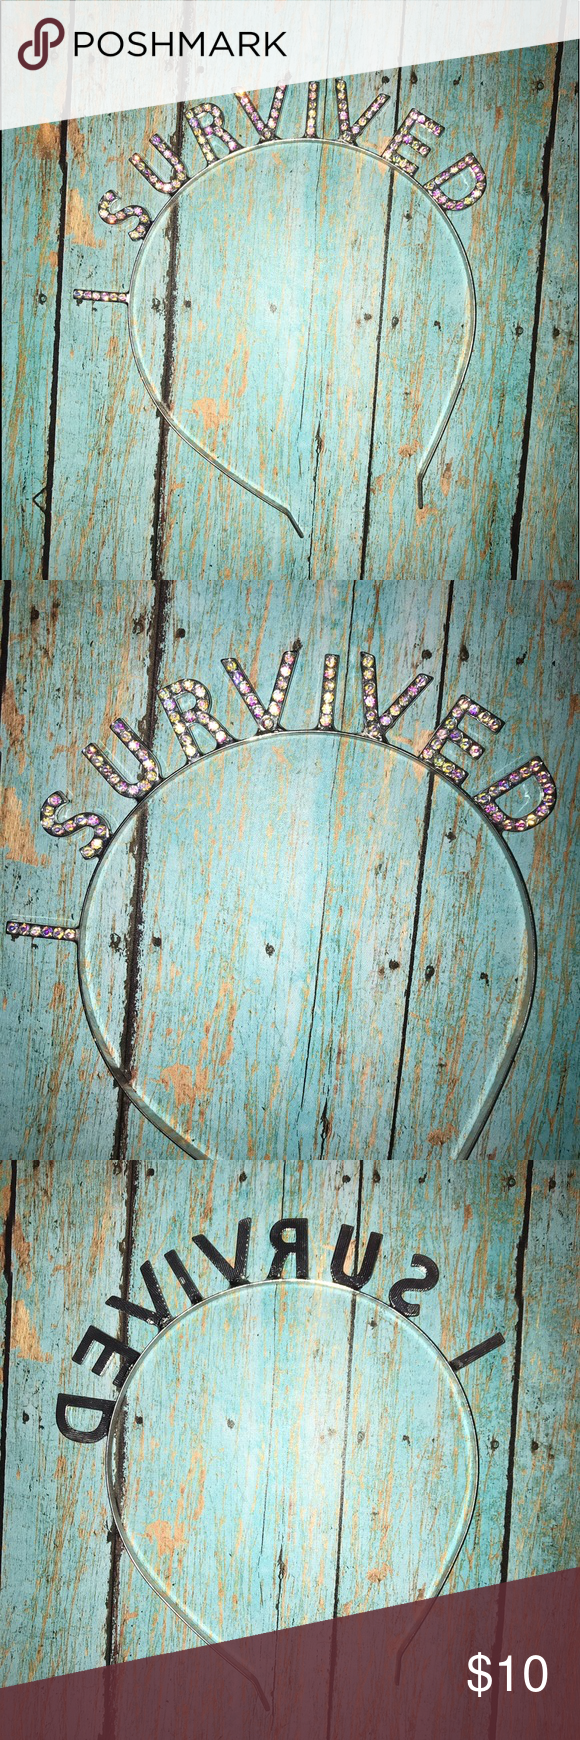 """I SURVIVED"" rhinestone headband Super sparkly and fun ""I SURVIVED"" rhin...  ""I SURVIVED"" rhinestone headband Super sparkly and fun ""I SURVIVED"" rhinestone headband. Ne #fun #Headband #rhin #Rhinestone #Sparkly #super #SURVIVED"